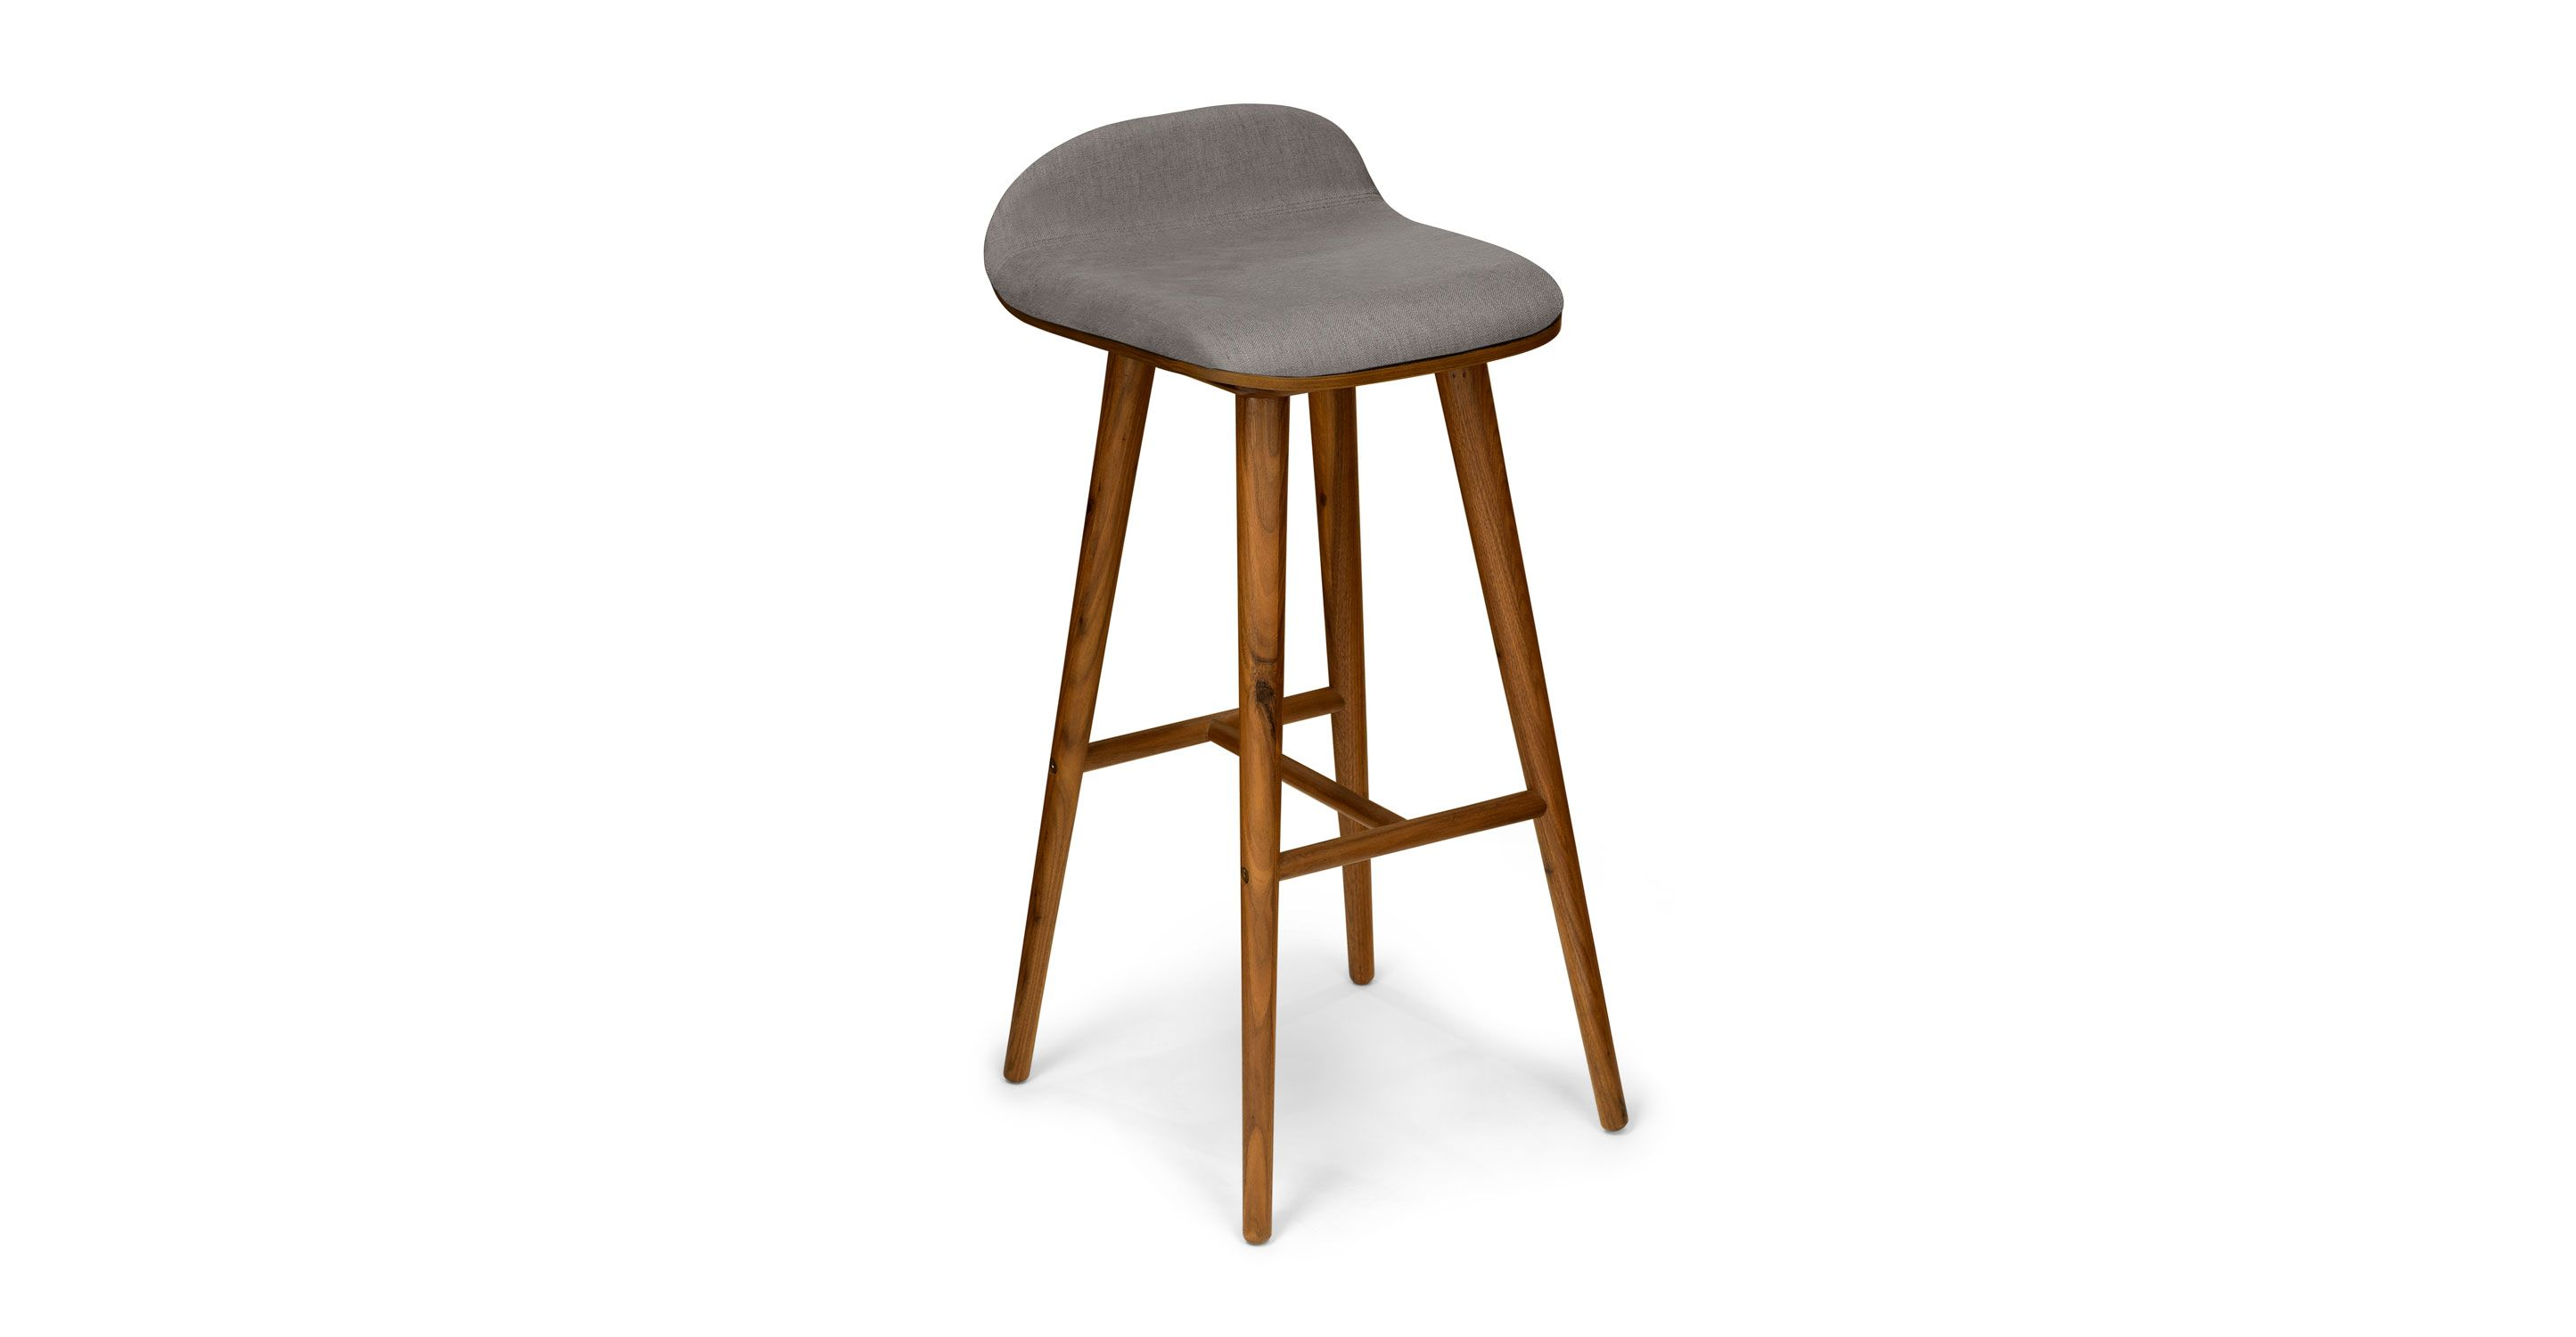 gray bar stool in walnut wood finish  article sede modern furniture. gray bar stool in walnut wood finish  article sede modern